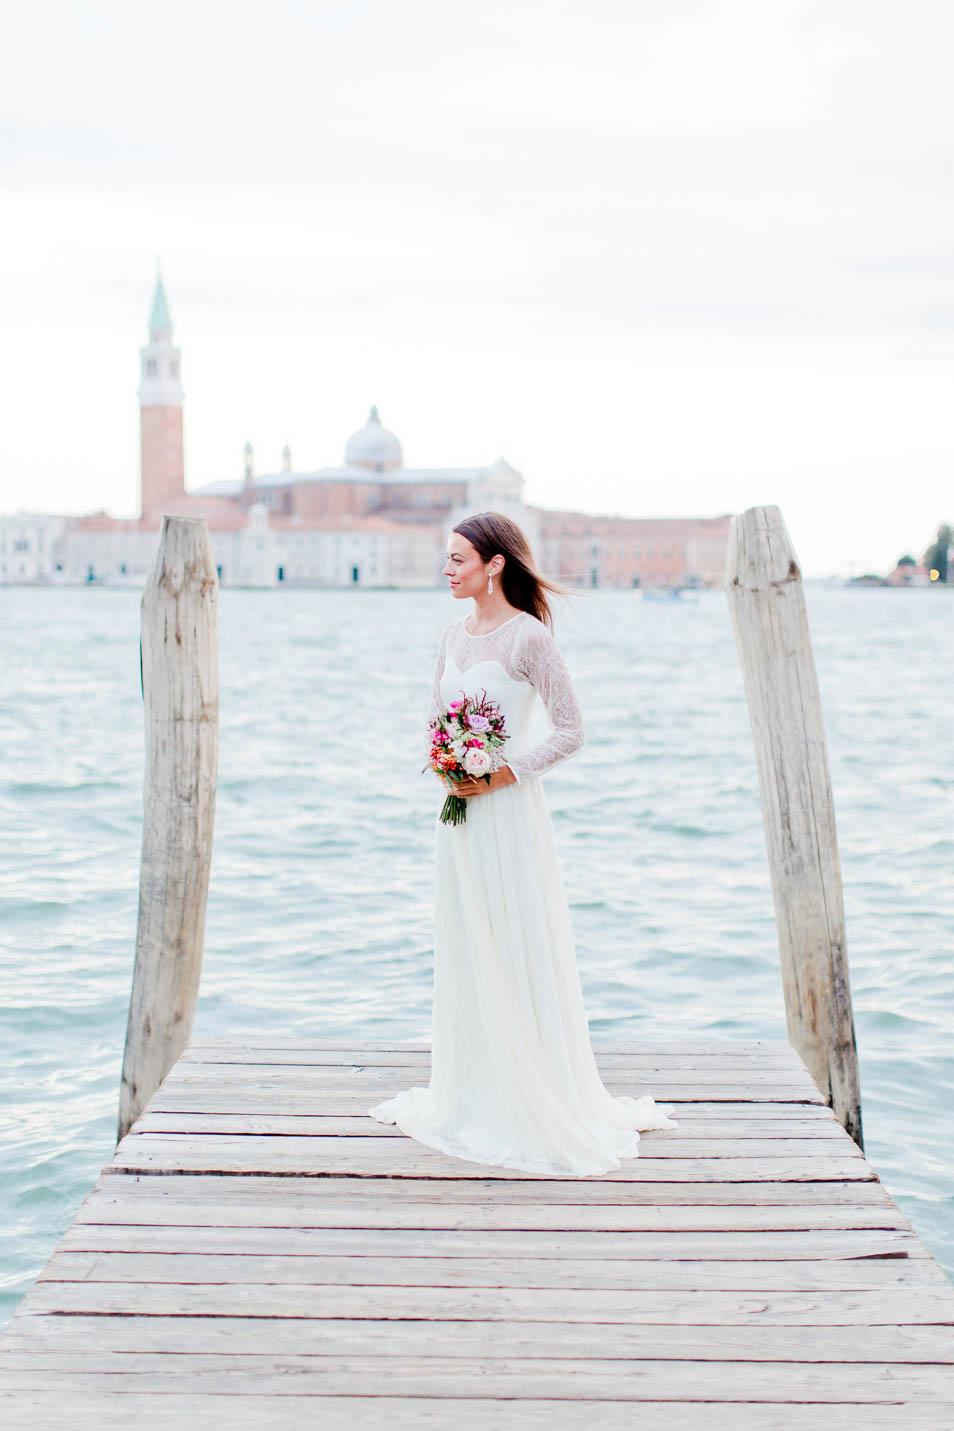 Traumhafte Kulisse on Destination in Venedig